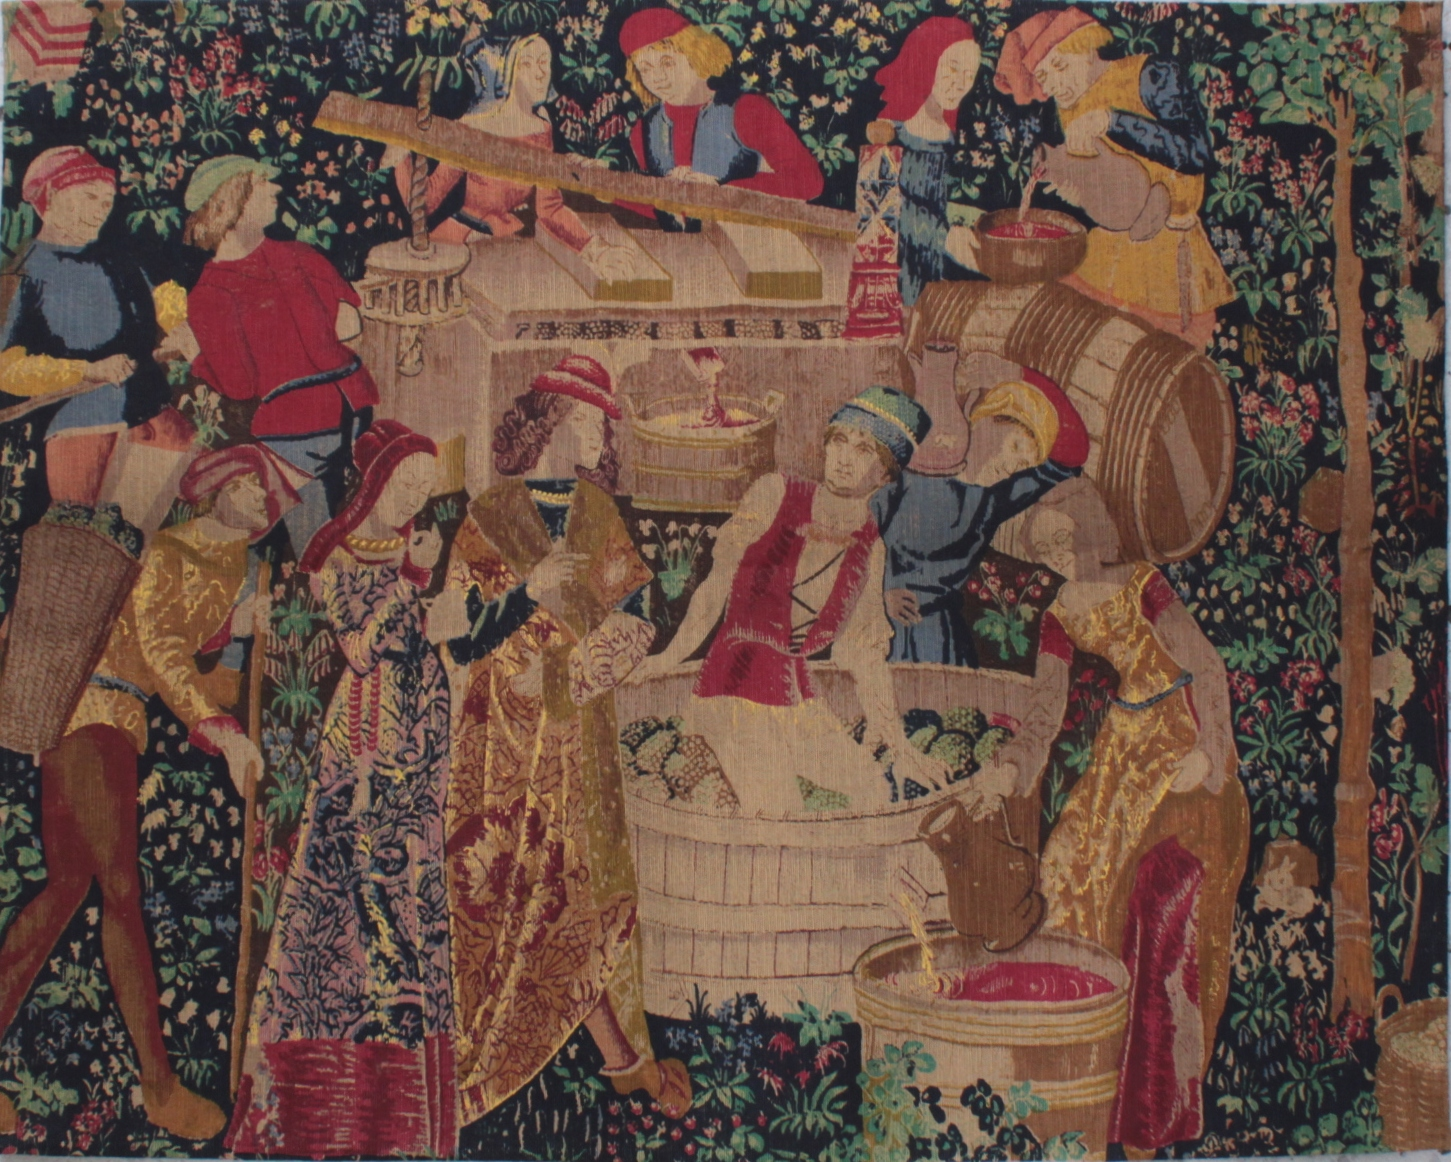 Gobelin im Stil des 18. Jh. Frankreich 2. Hälfte 20. Jh. 'Weinlese'